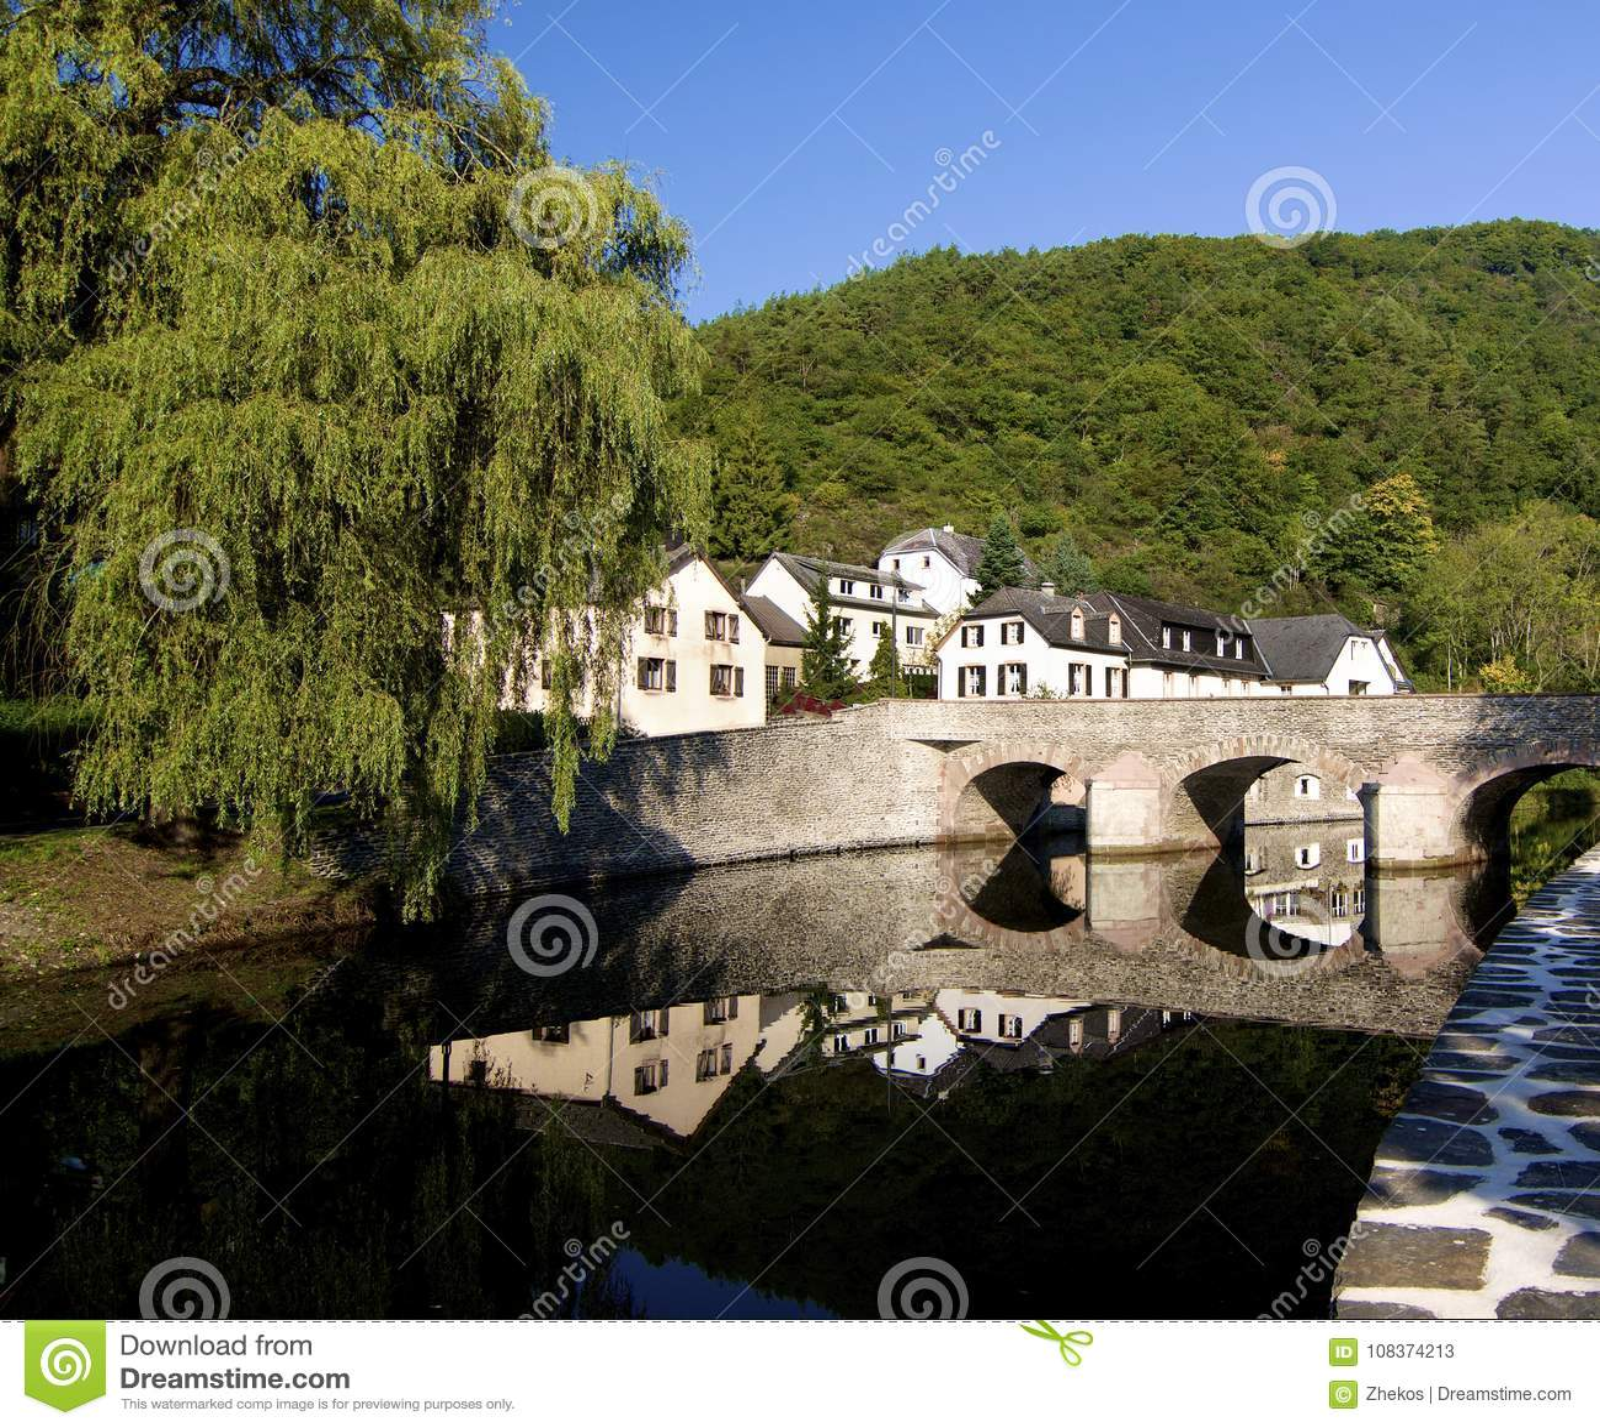 Esch sura Pewny w Luksemburg